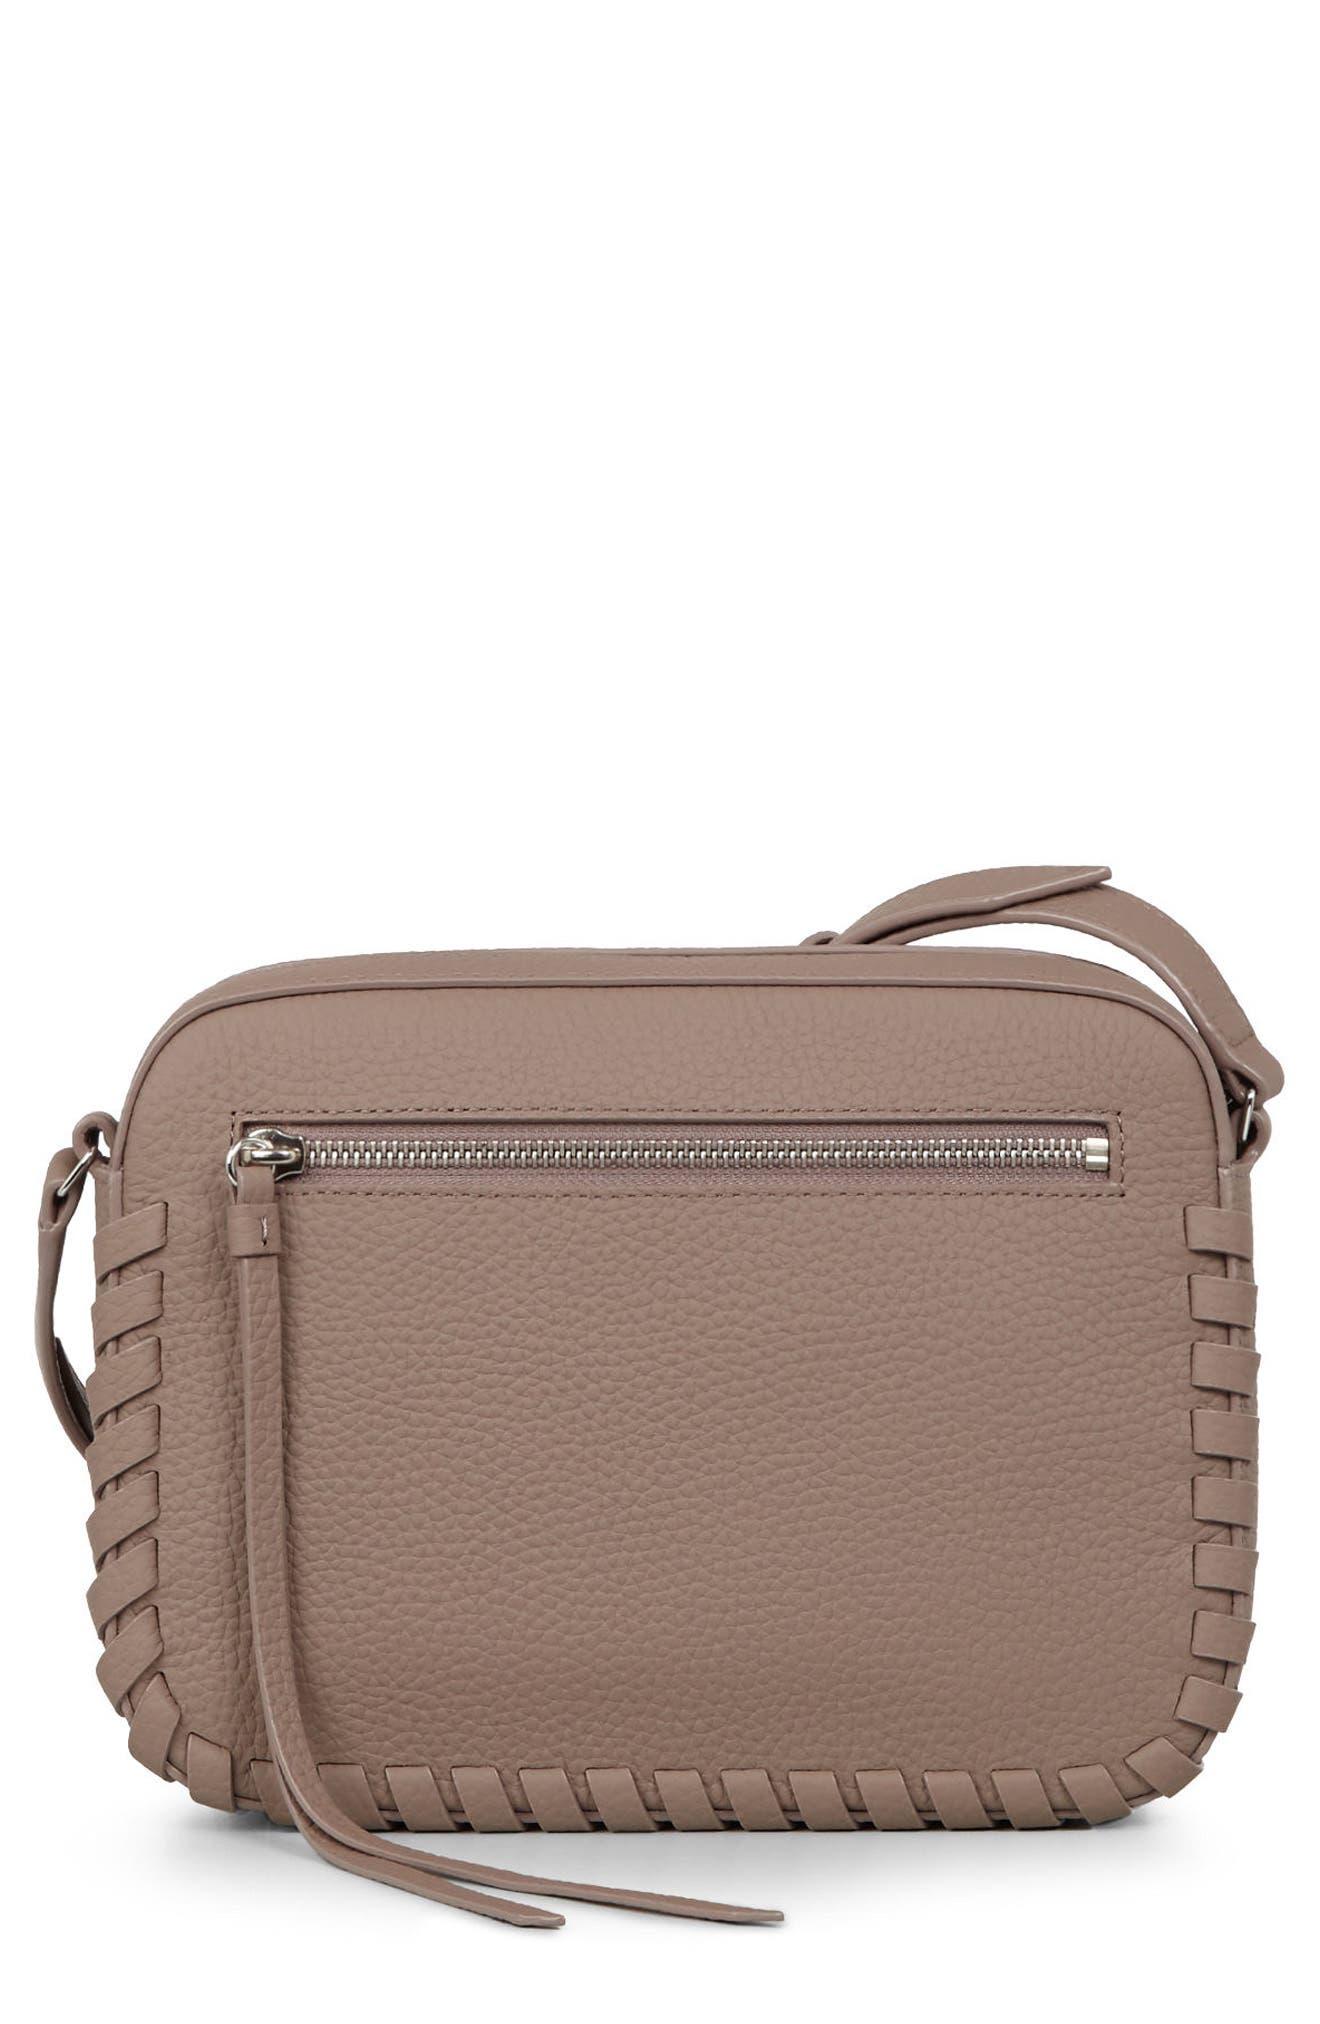 Kepi Mini Leather Crossbody Bag,                         Main,                         color, ALMOND BROWN